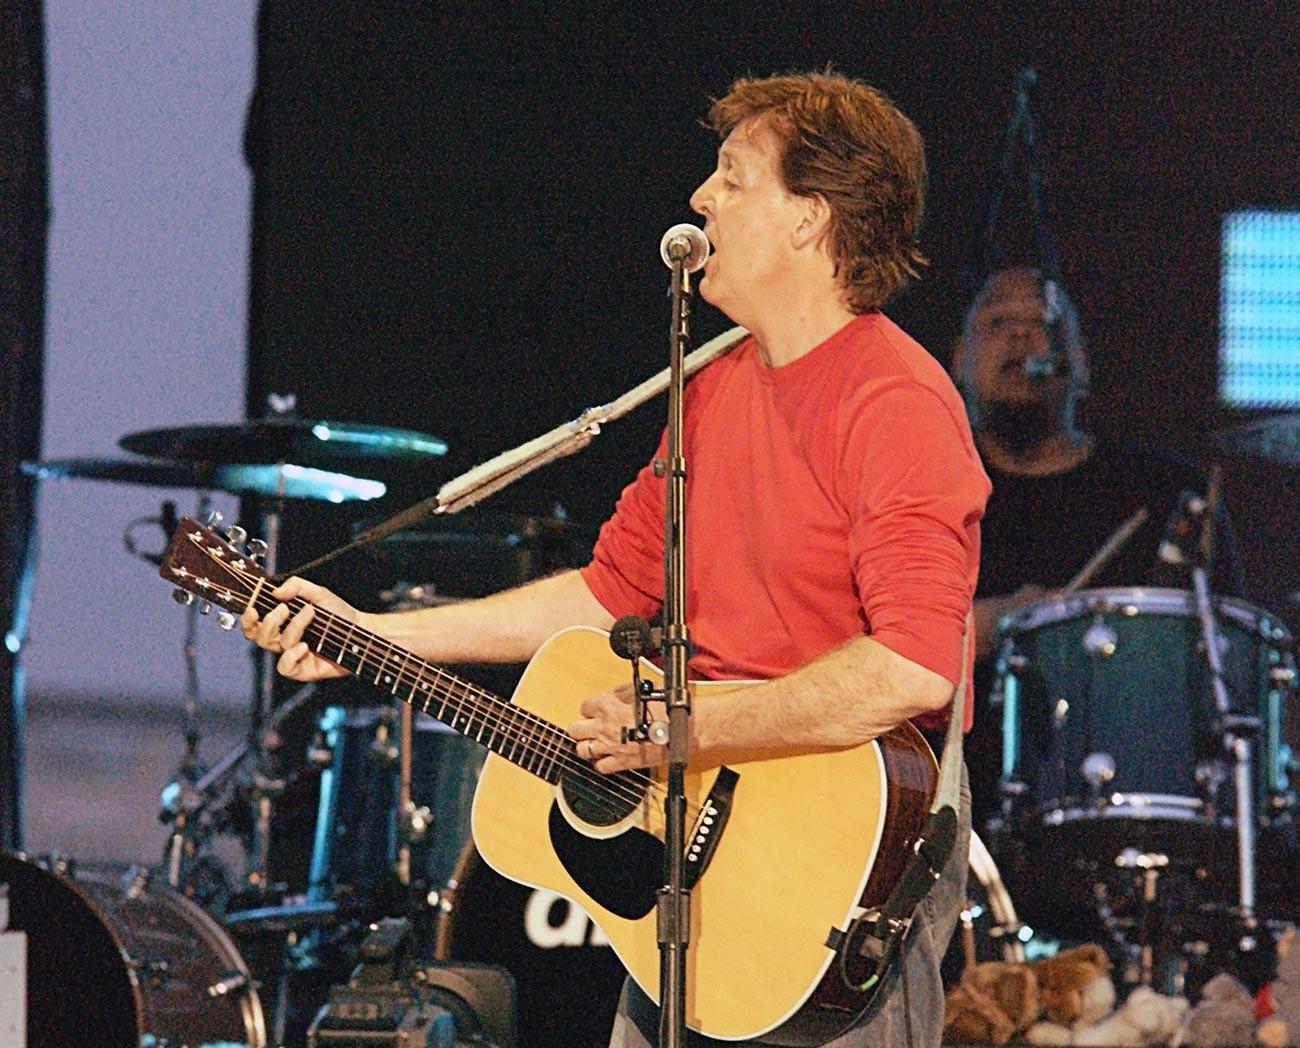 McCartney in concerto a Mosca